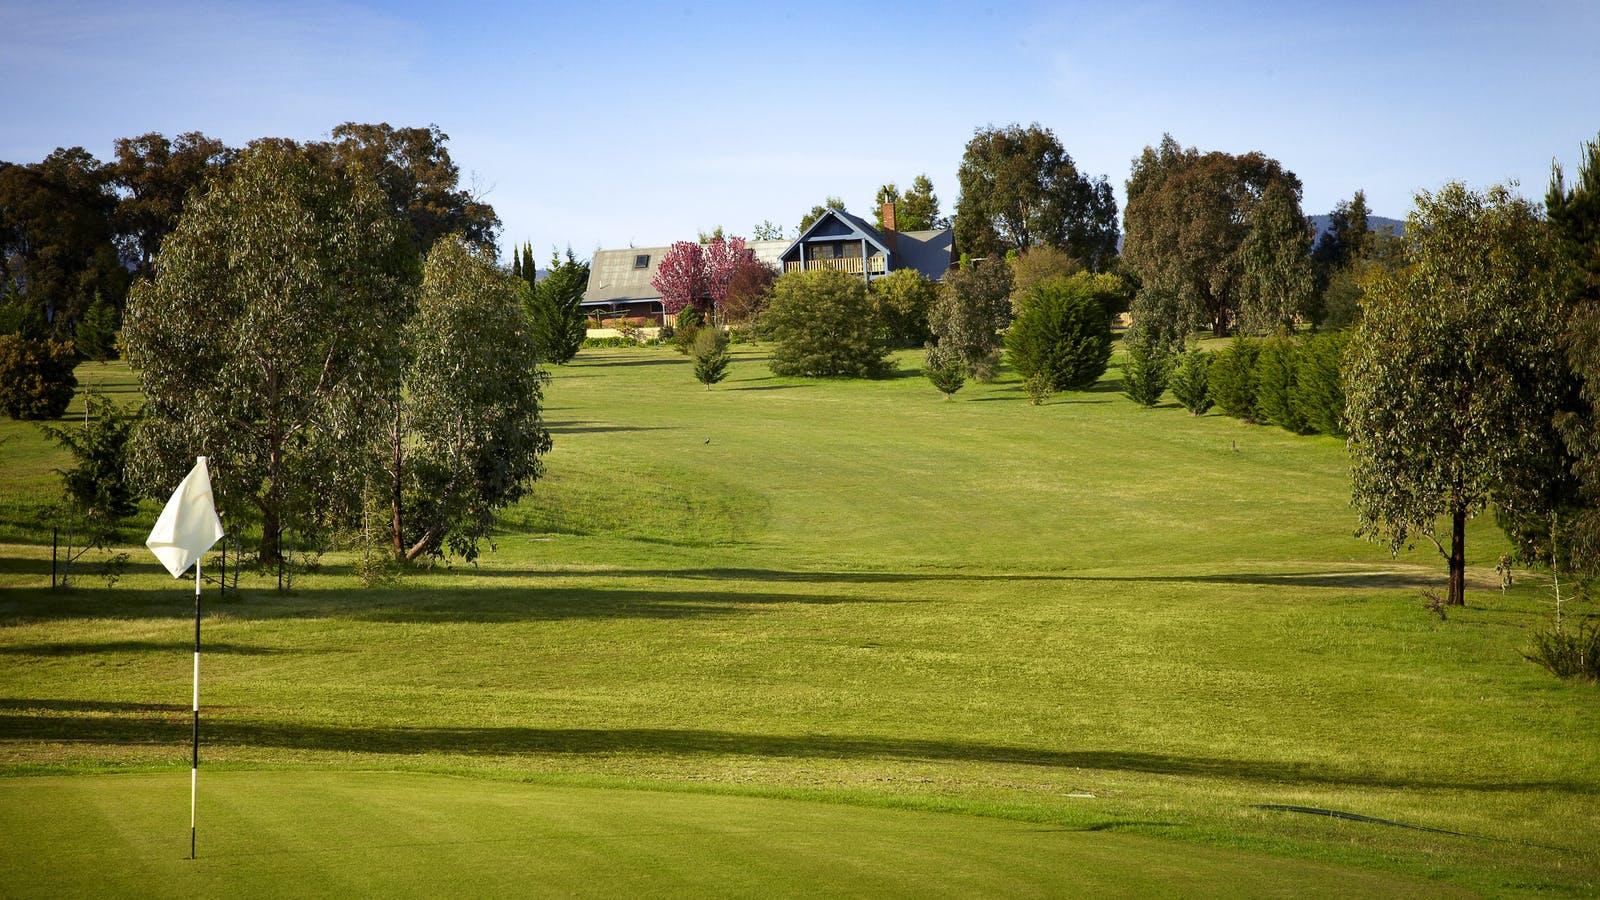 8th hole on golf course